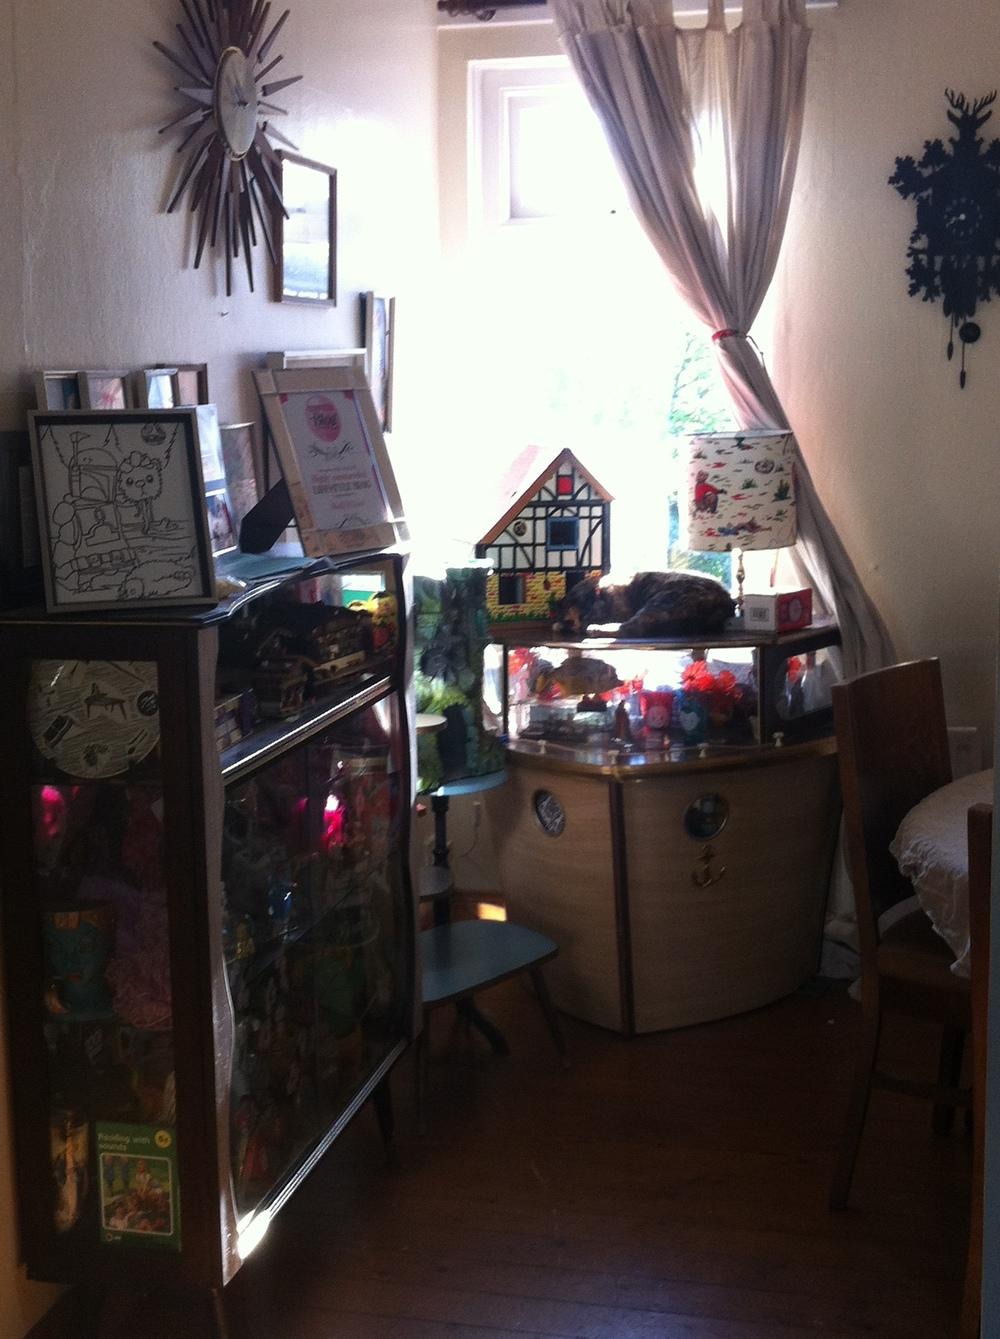 A Peek Inside The World of Kitsch's House